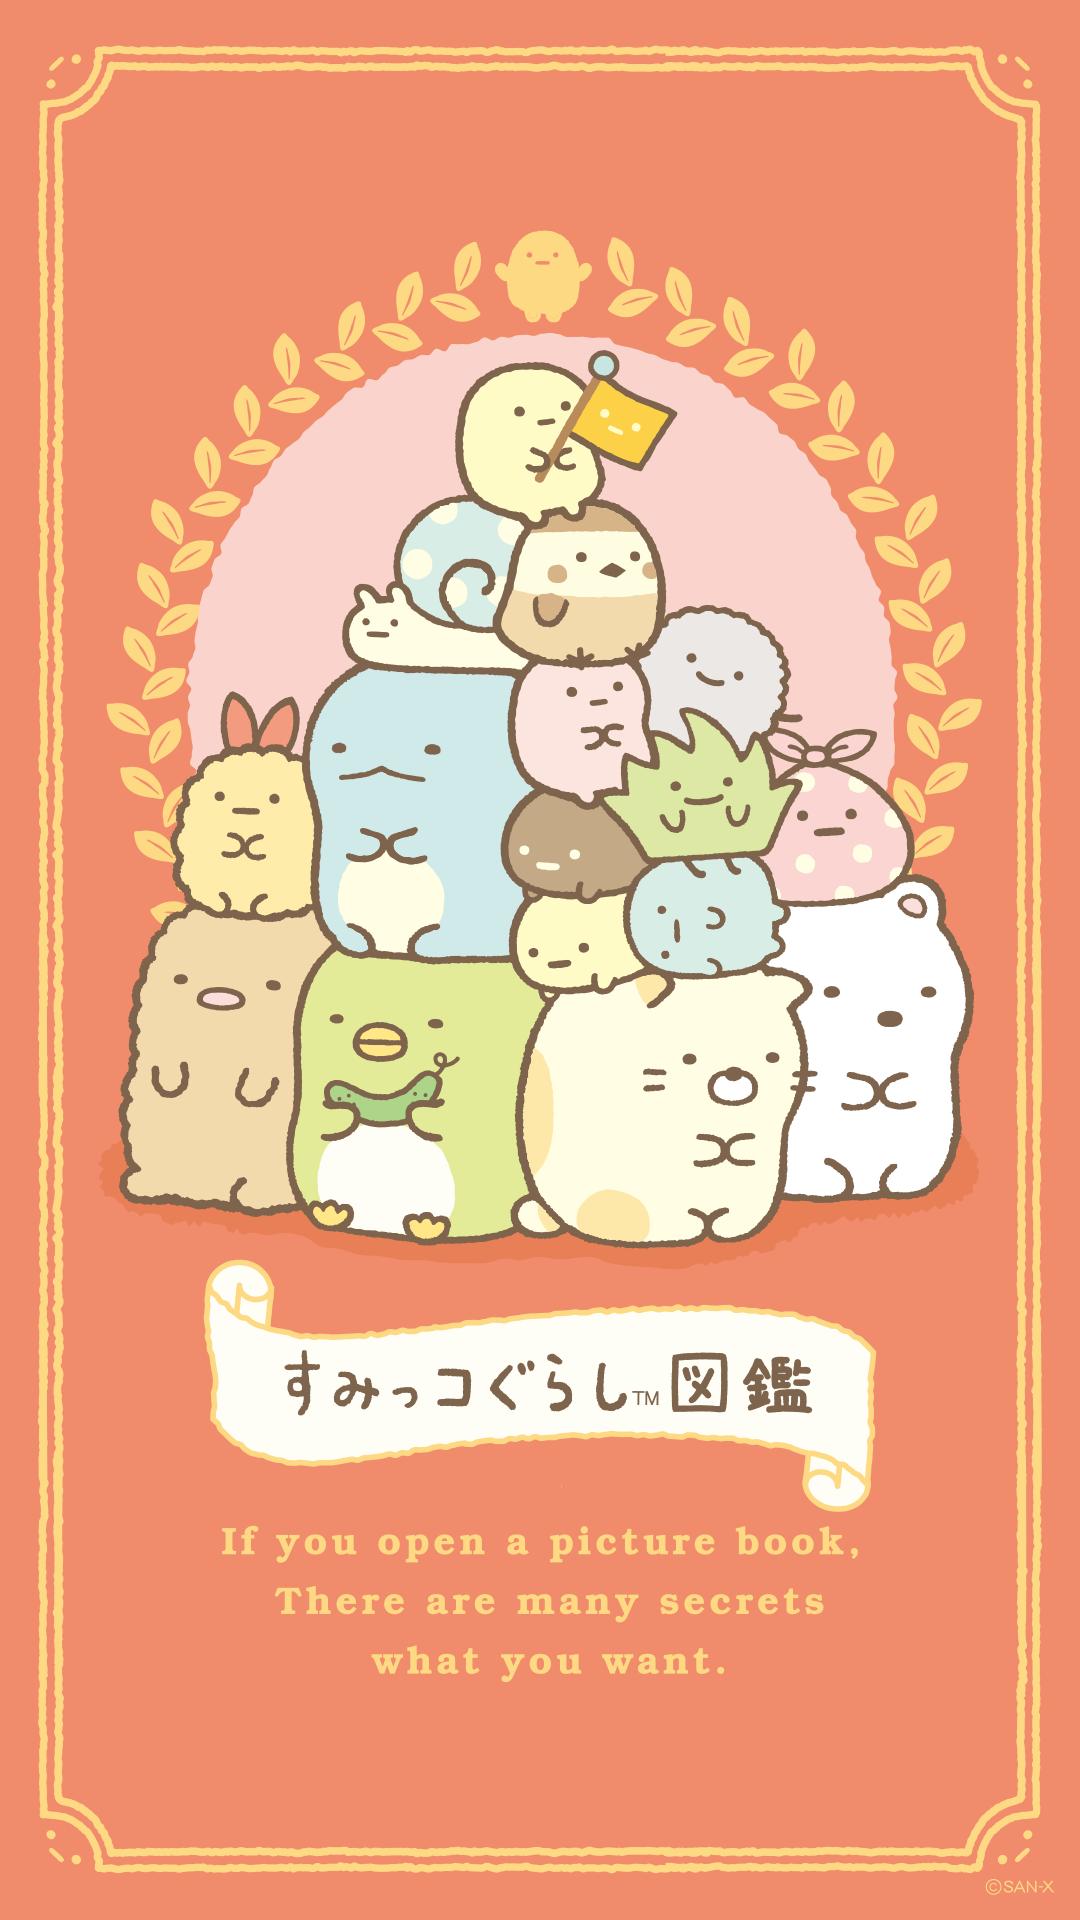 Sp 1080 1920 Png 1080 1920 Kawaii Doodles Kawaii Drawings Cute Stickers